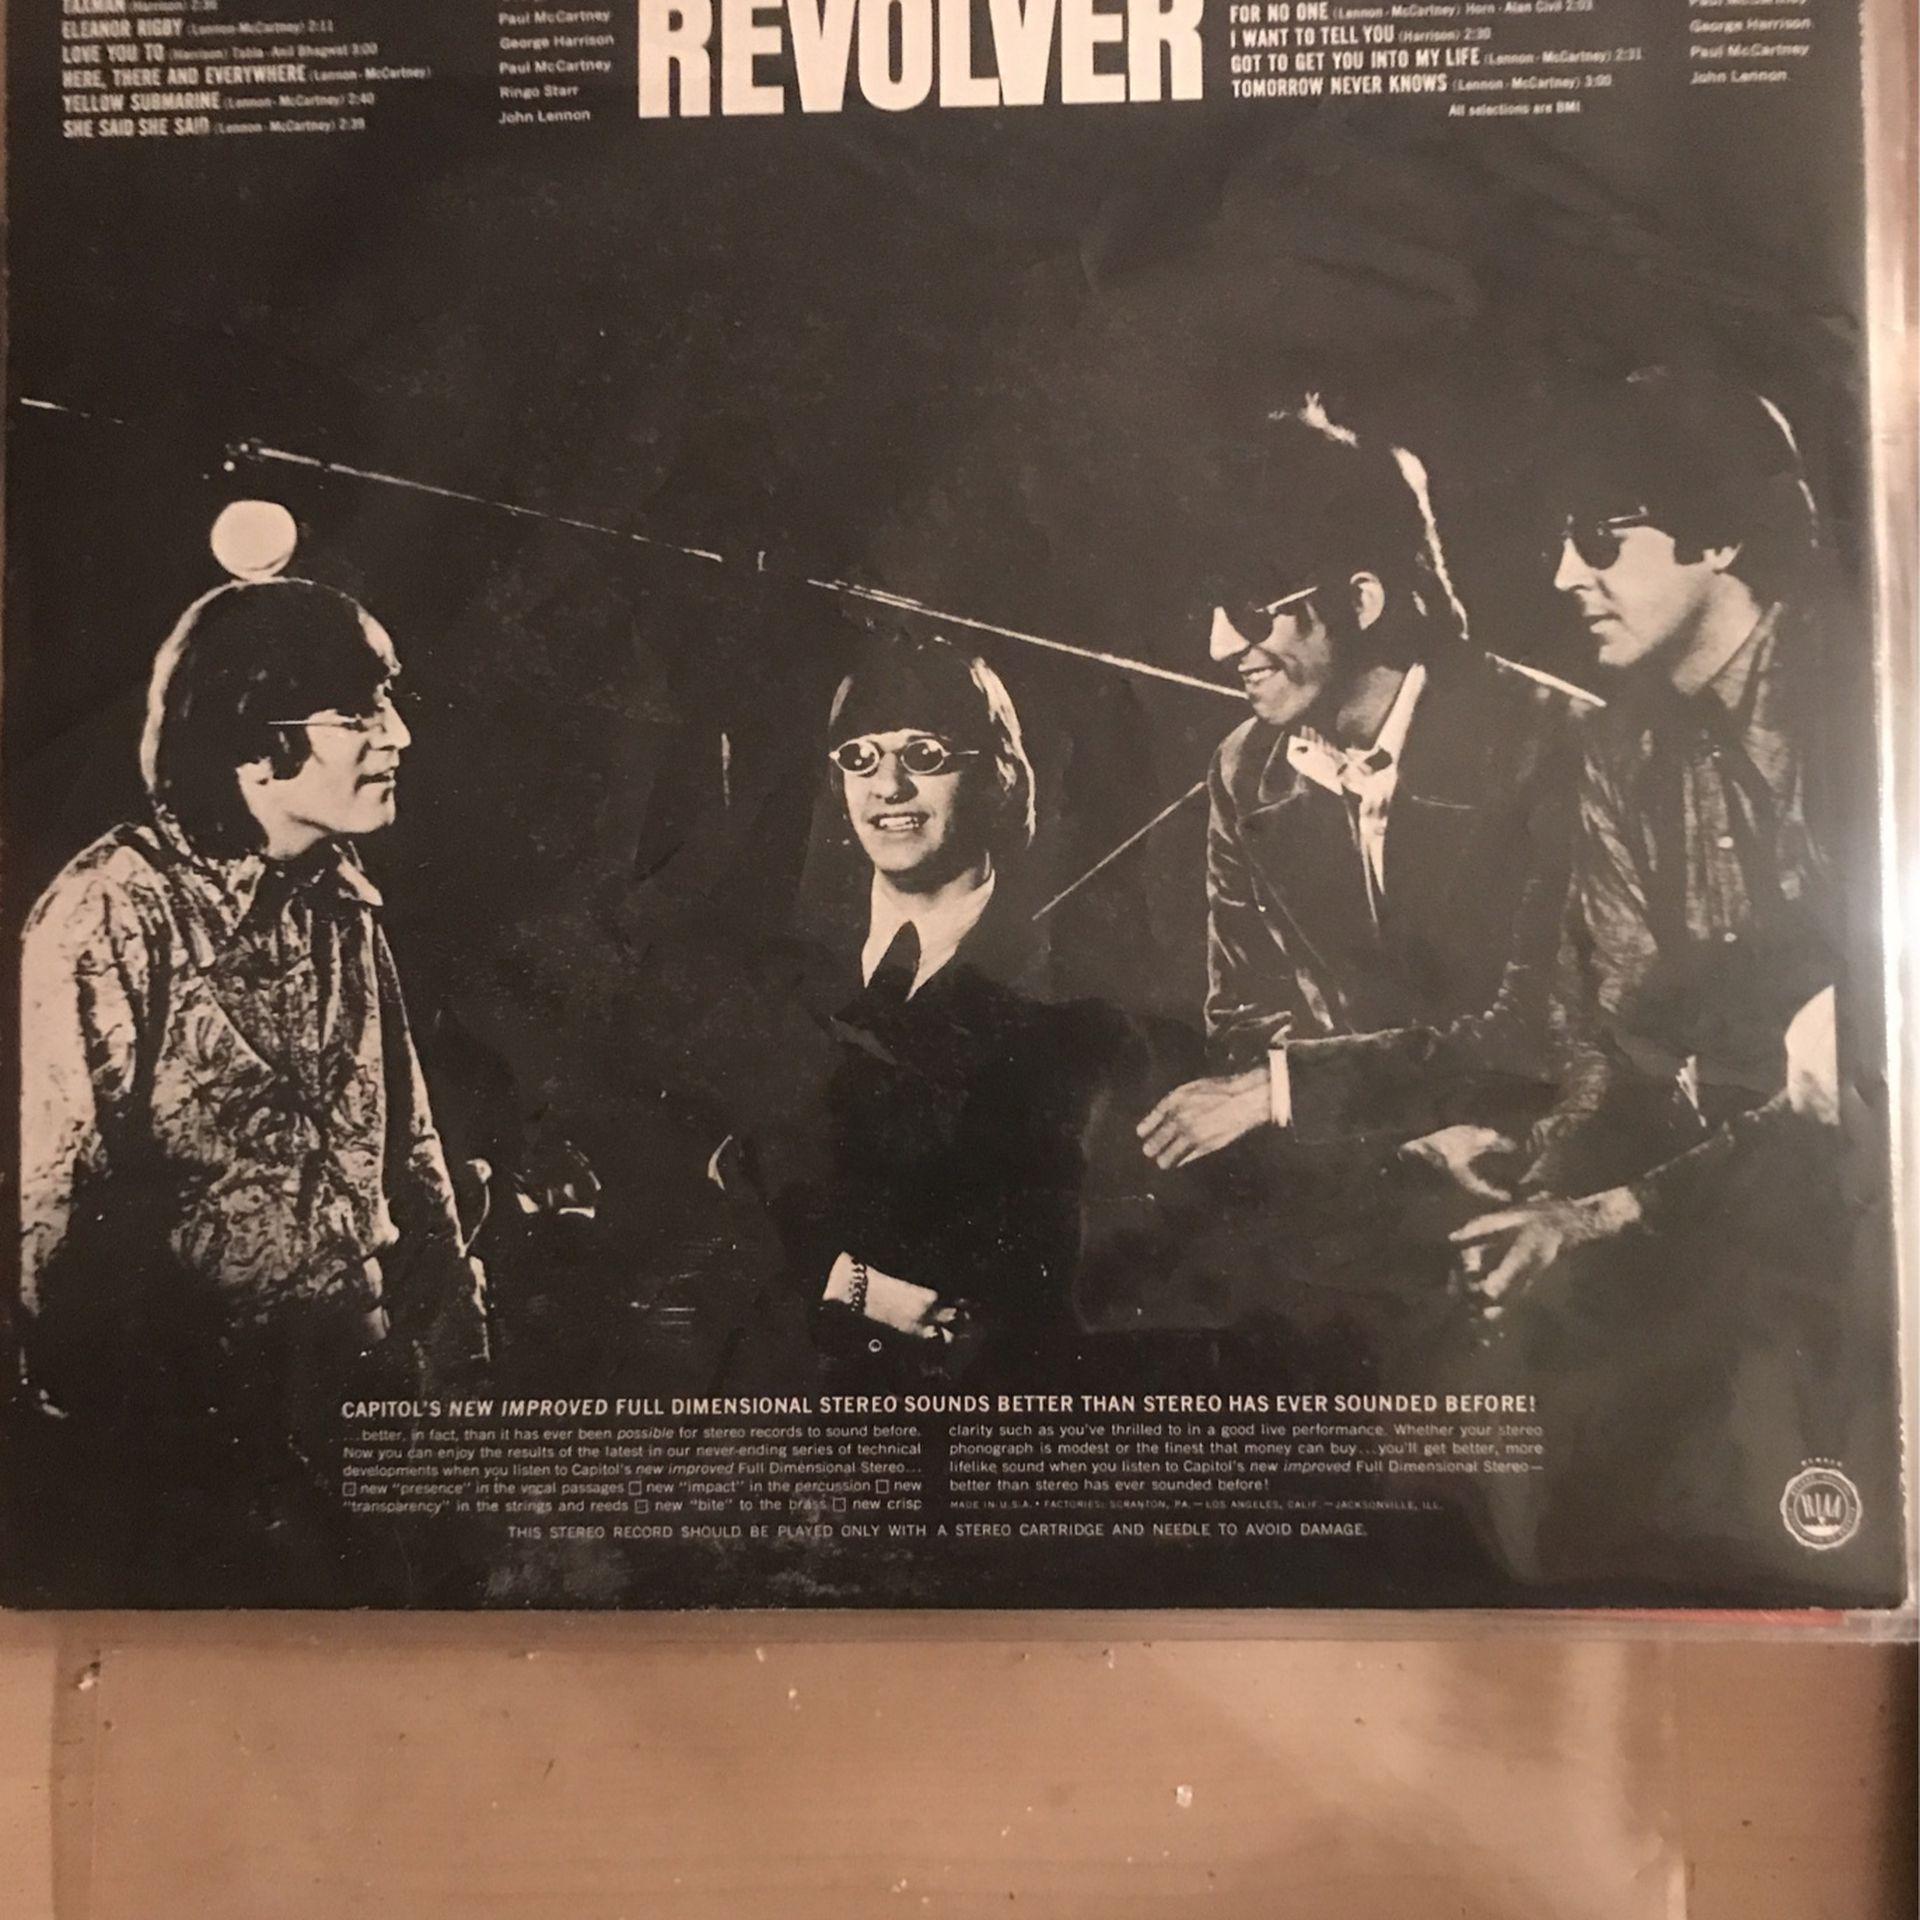 Beattles( Revolver), Keith Richard (Talk Is Cheap)